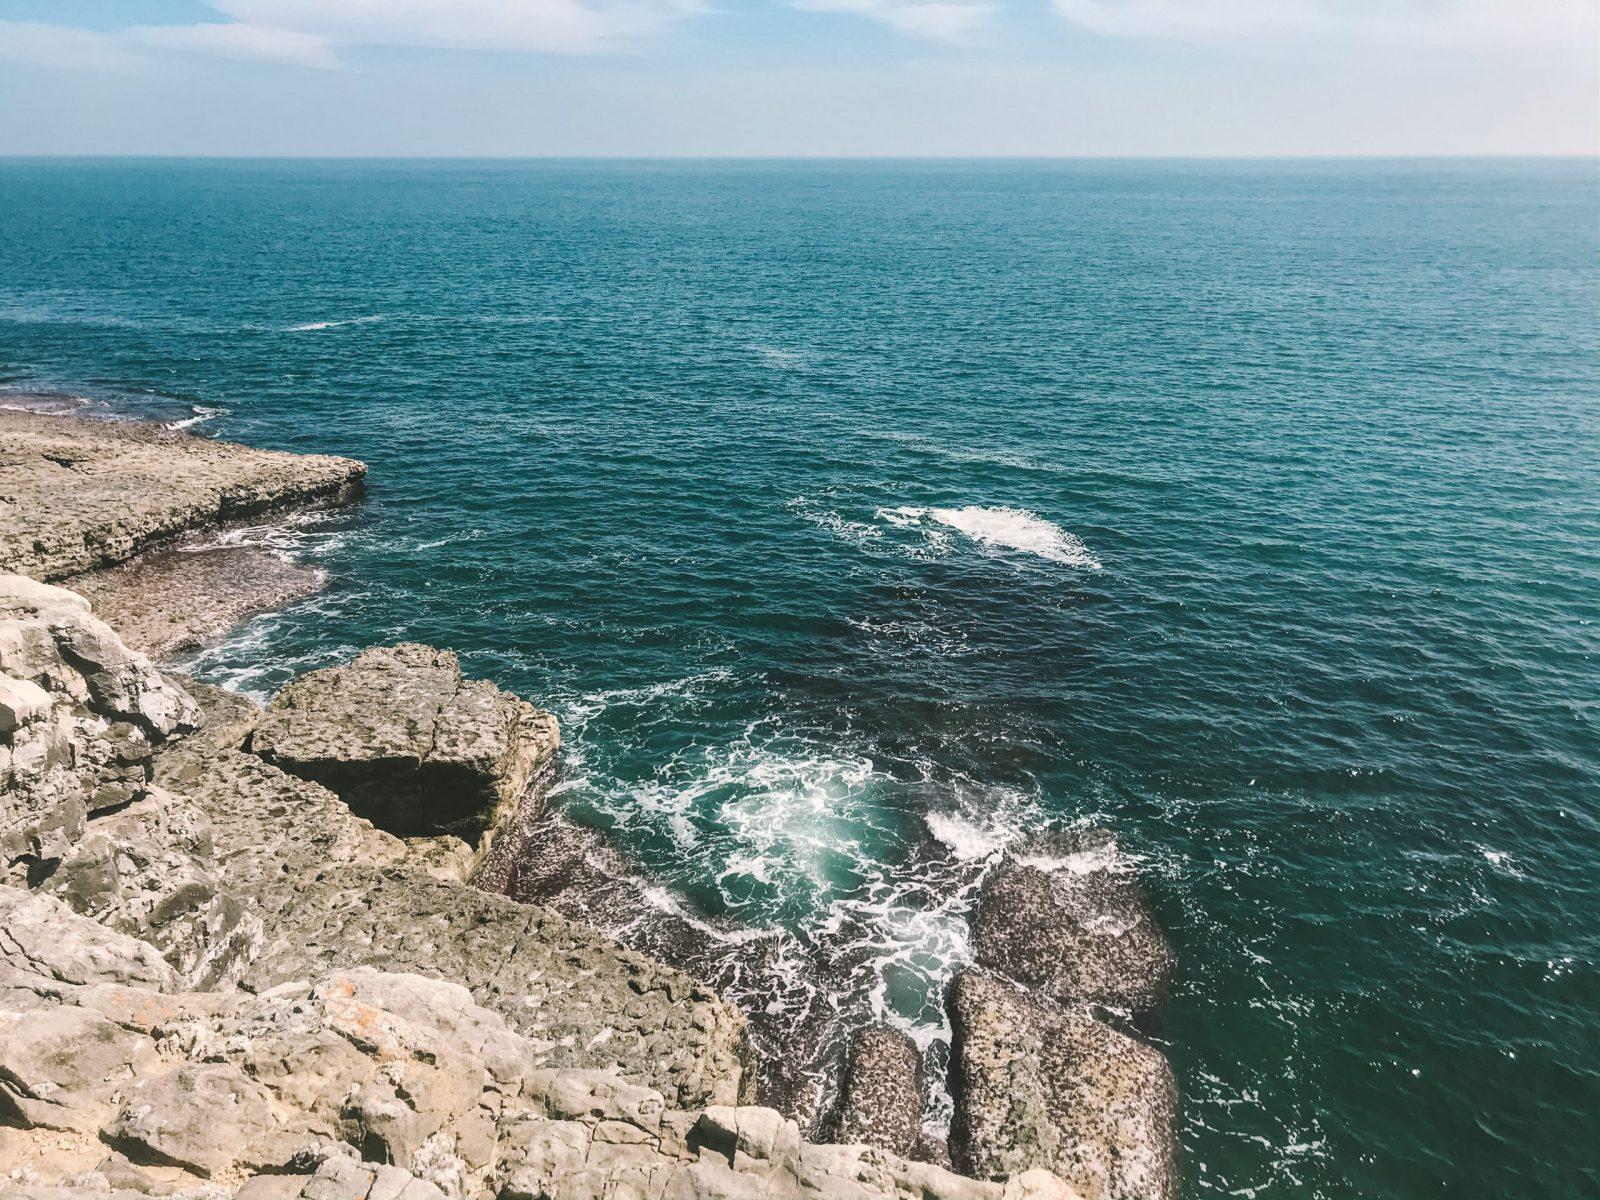 Jurassic coast walk the dancing ledge